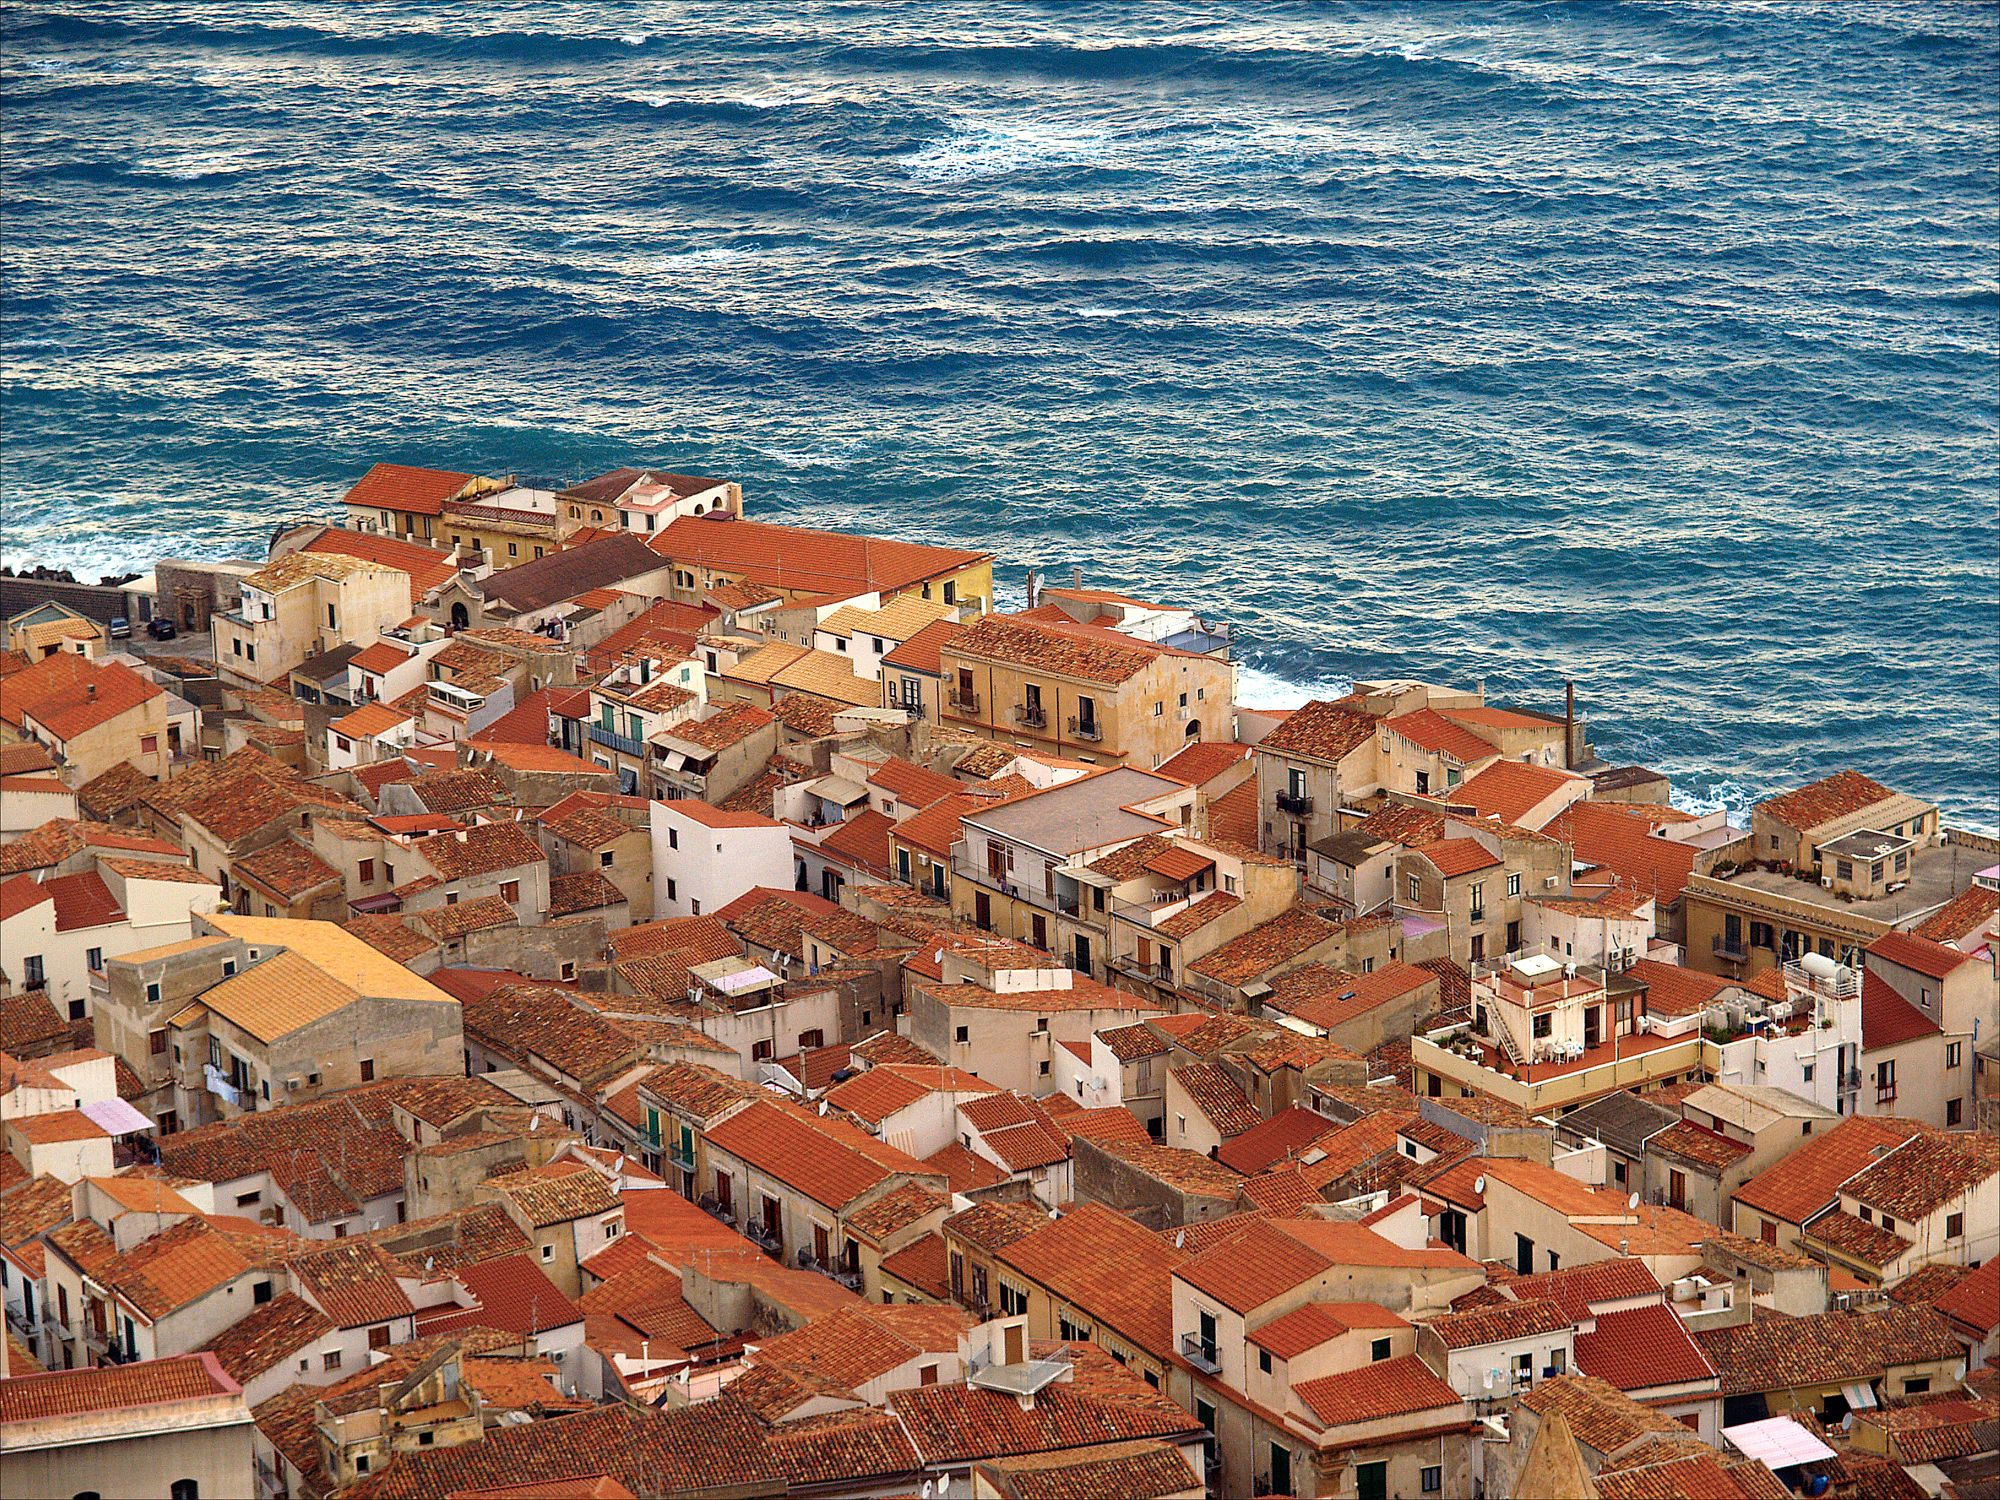 7-We Live Here-Cefalu, Sicily.jpg